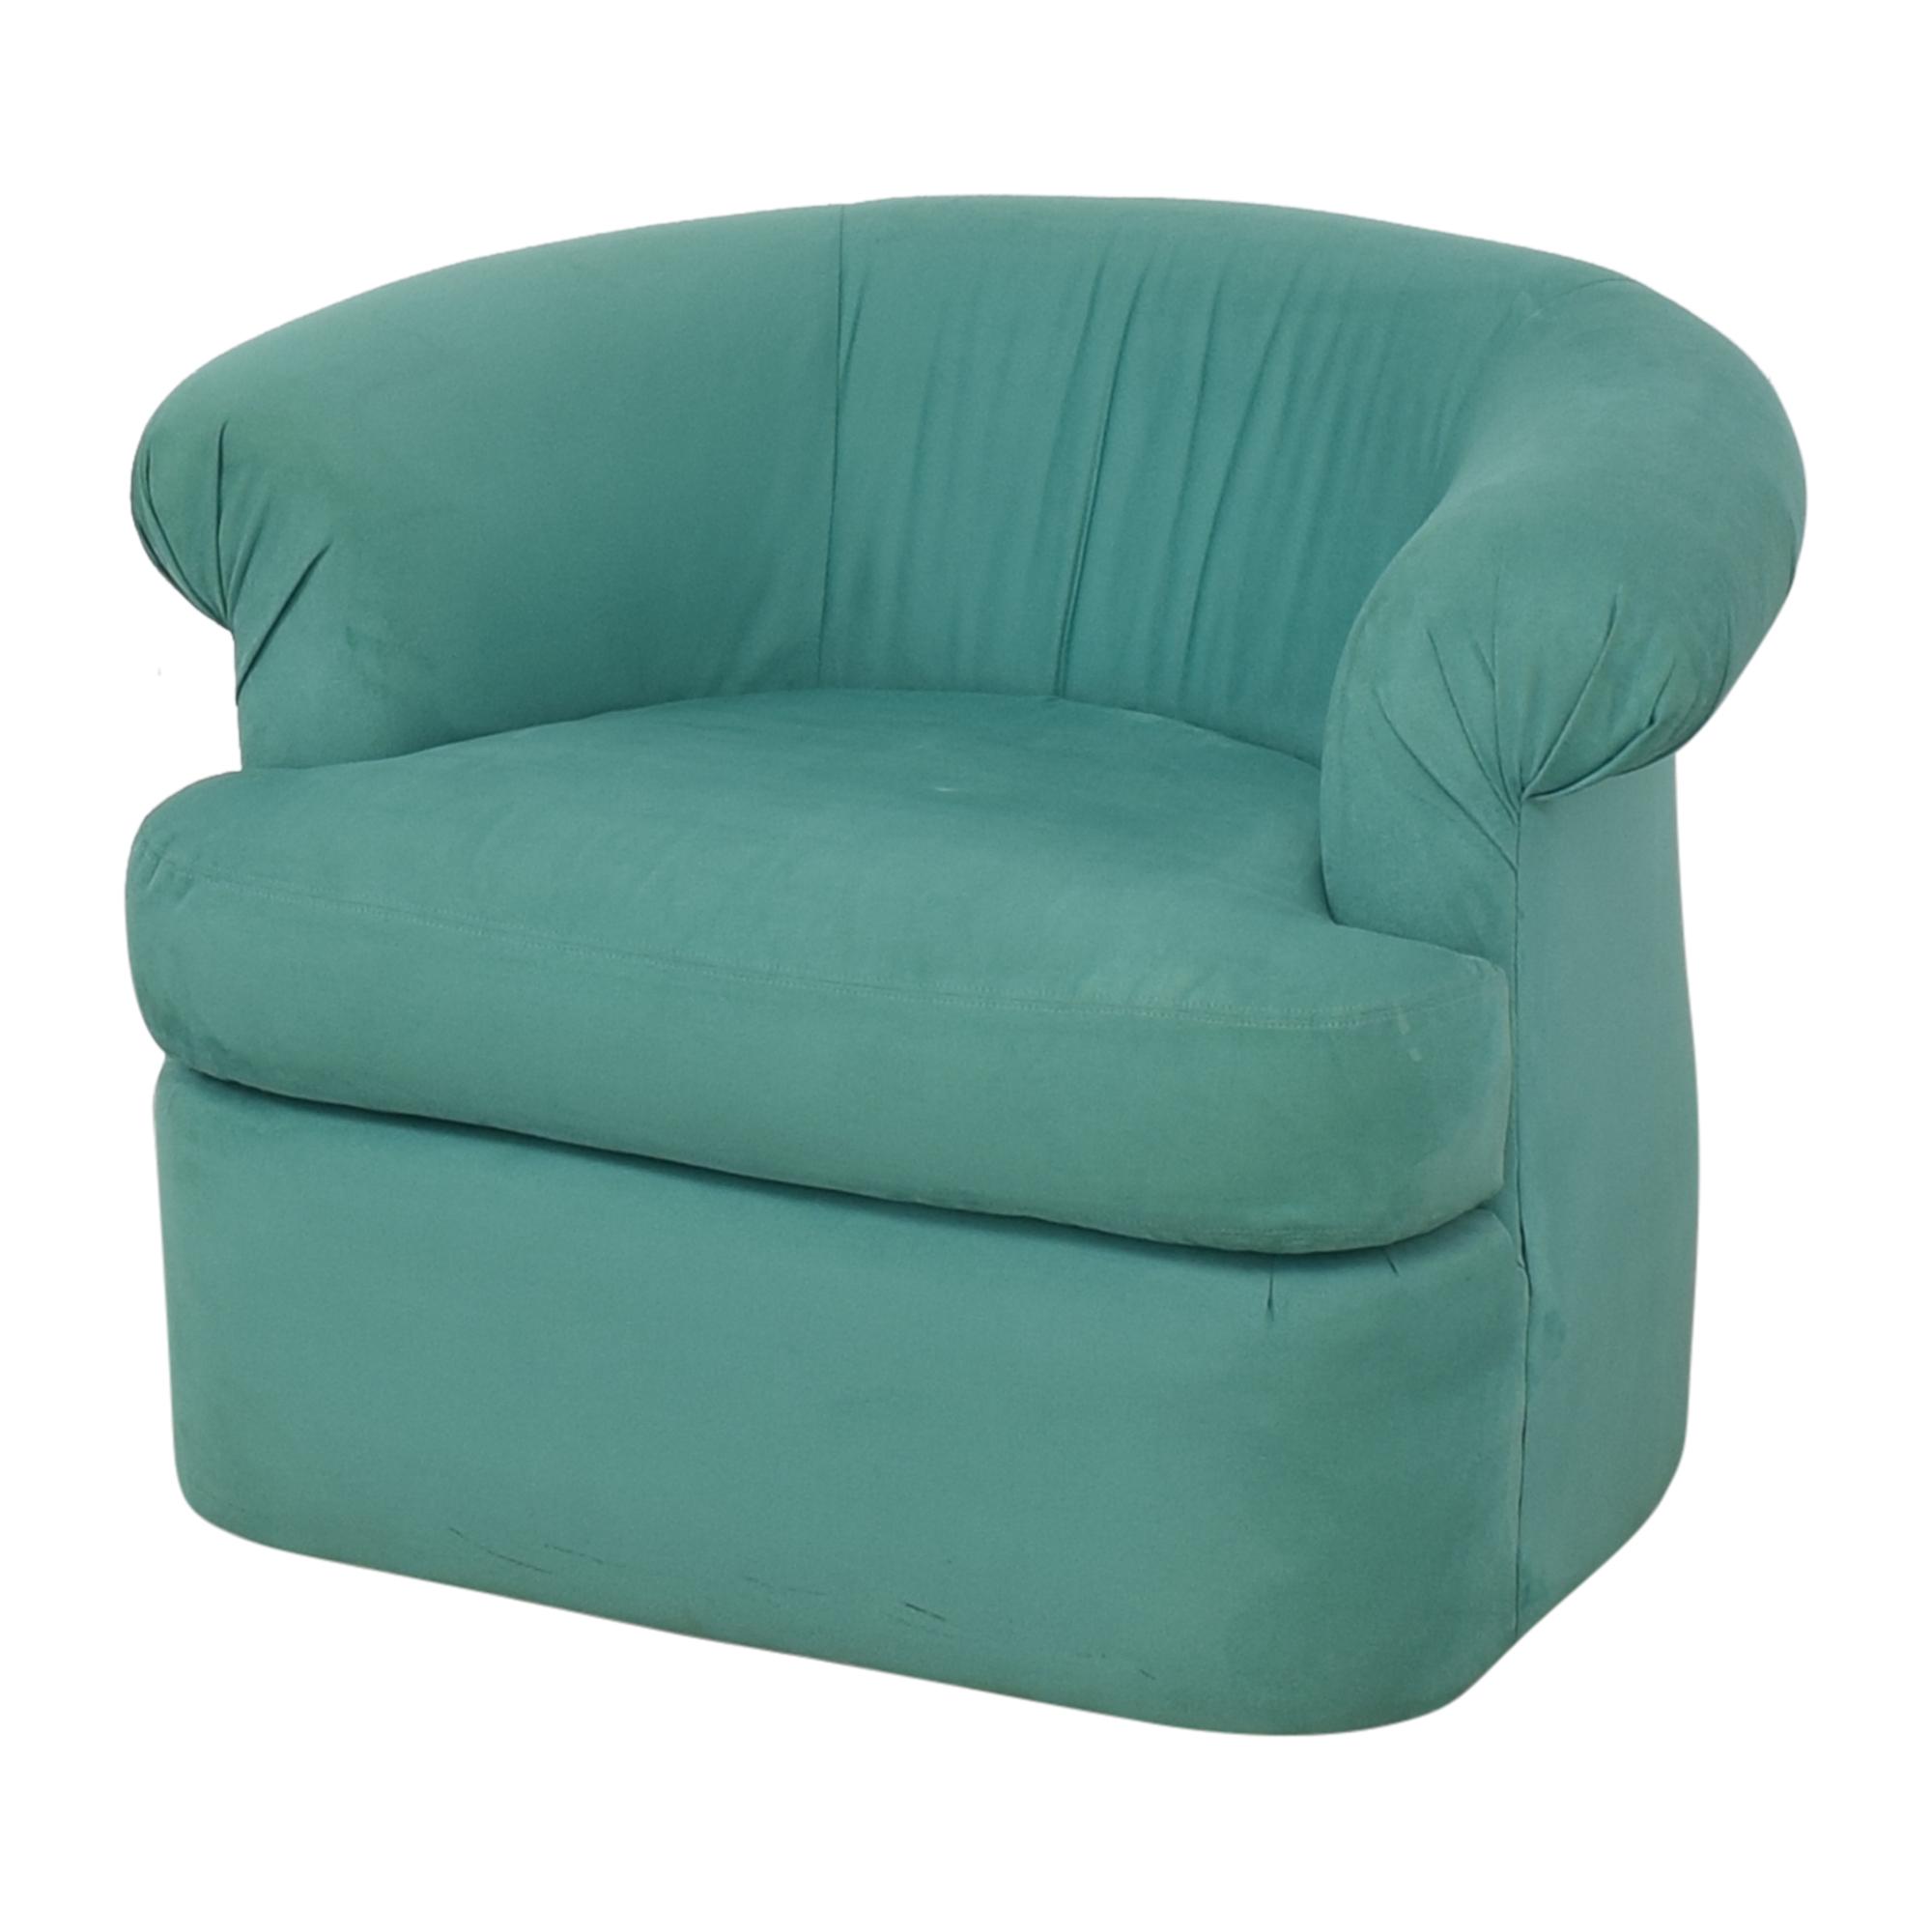 Directional Furniture Directional Furniture Suede Chair Chairs